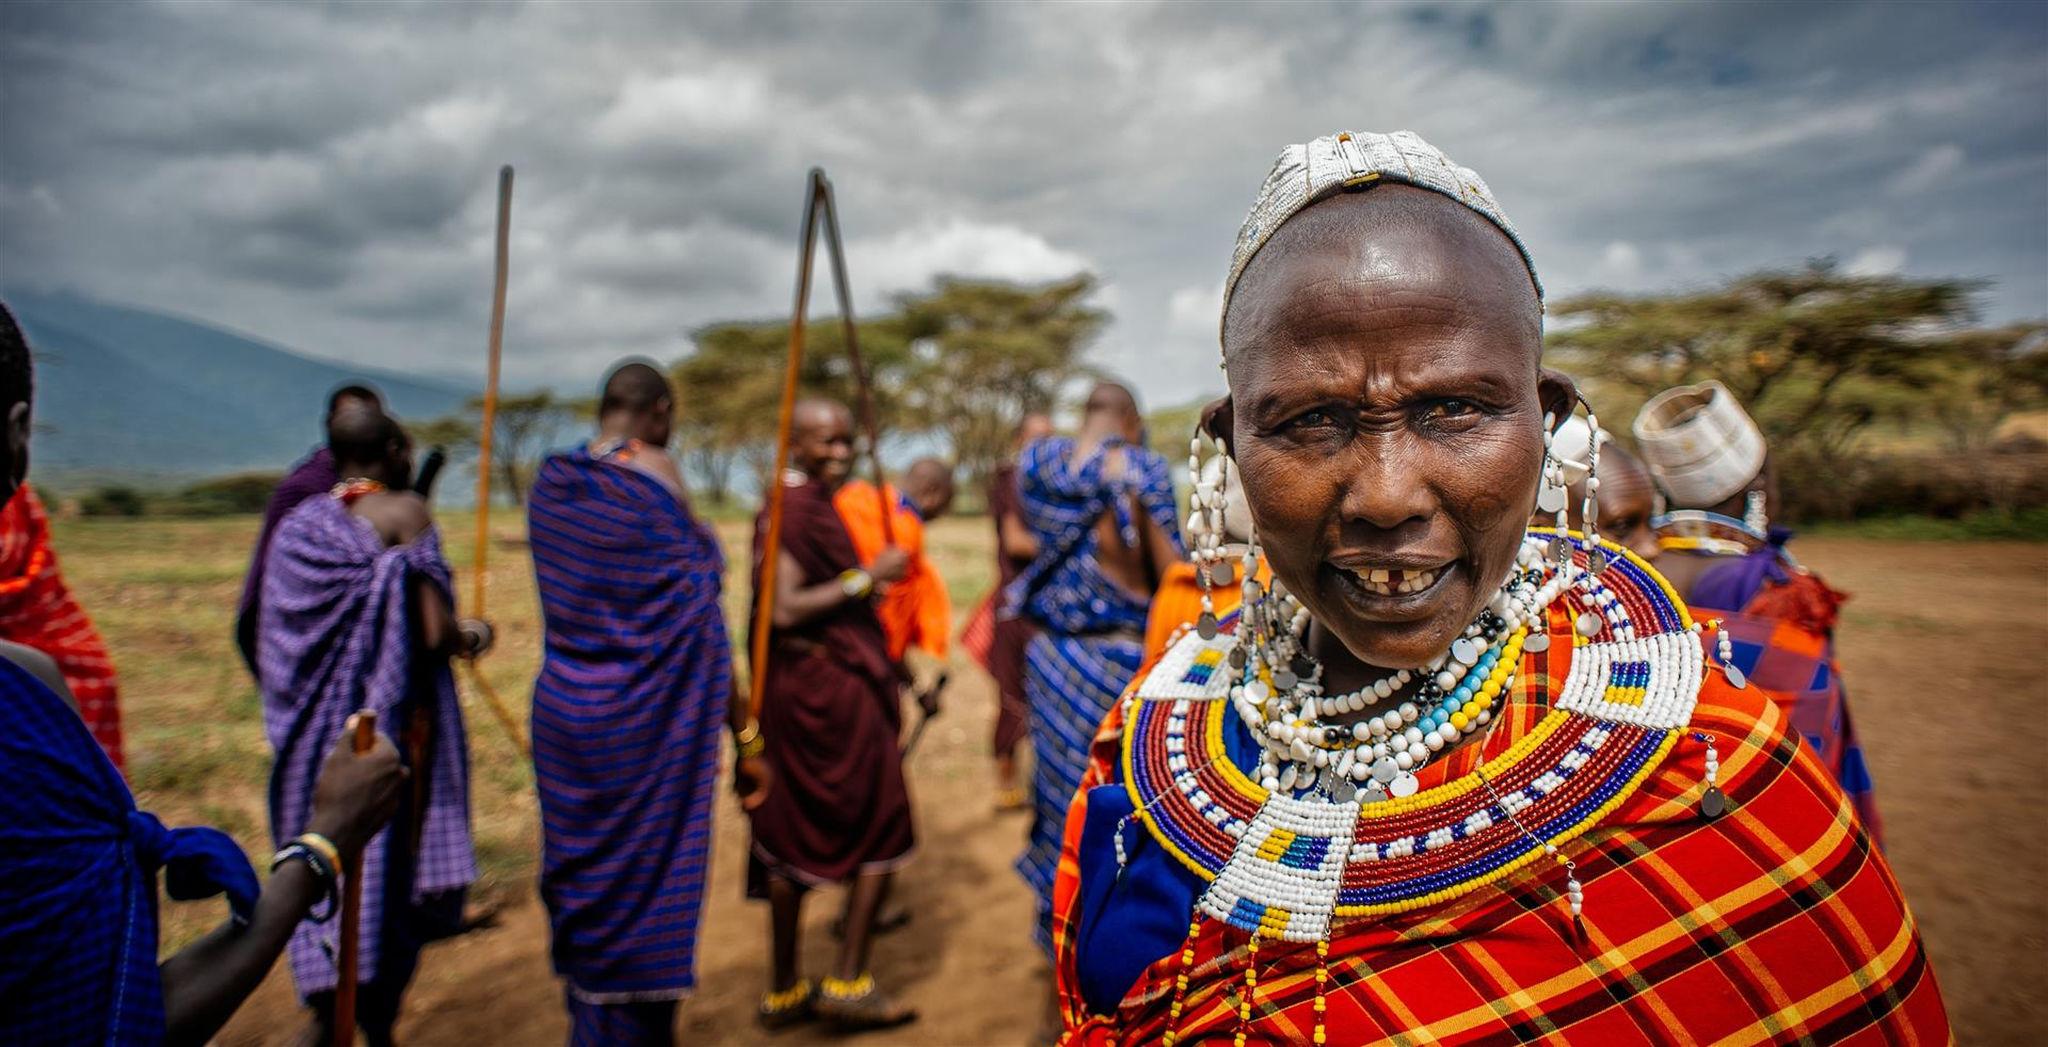 a-group-of-maasai-warriors-in-kenya